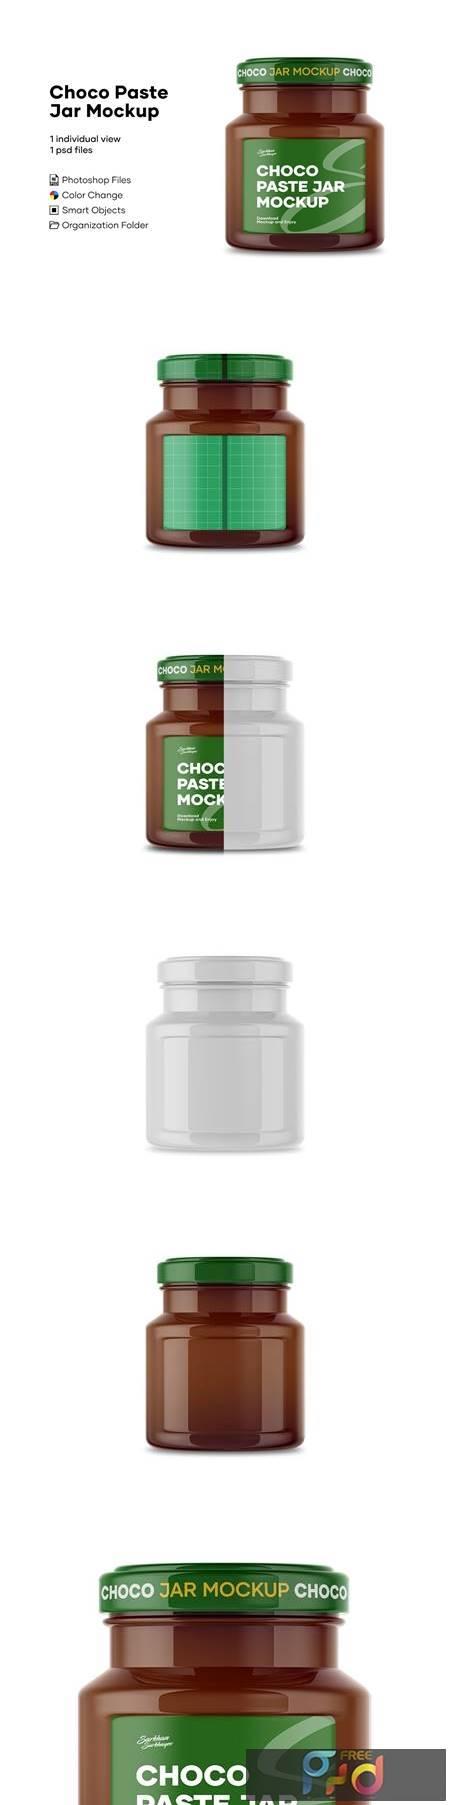 Glass Chocolate Spread Jar Mockup 4893156 1